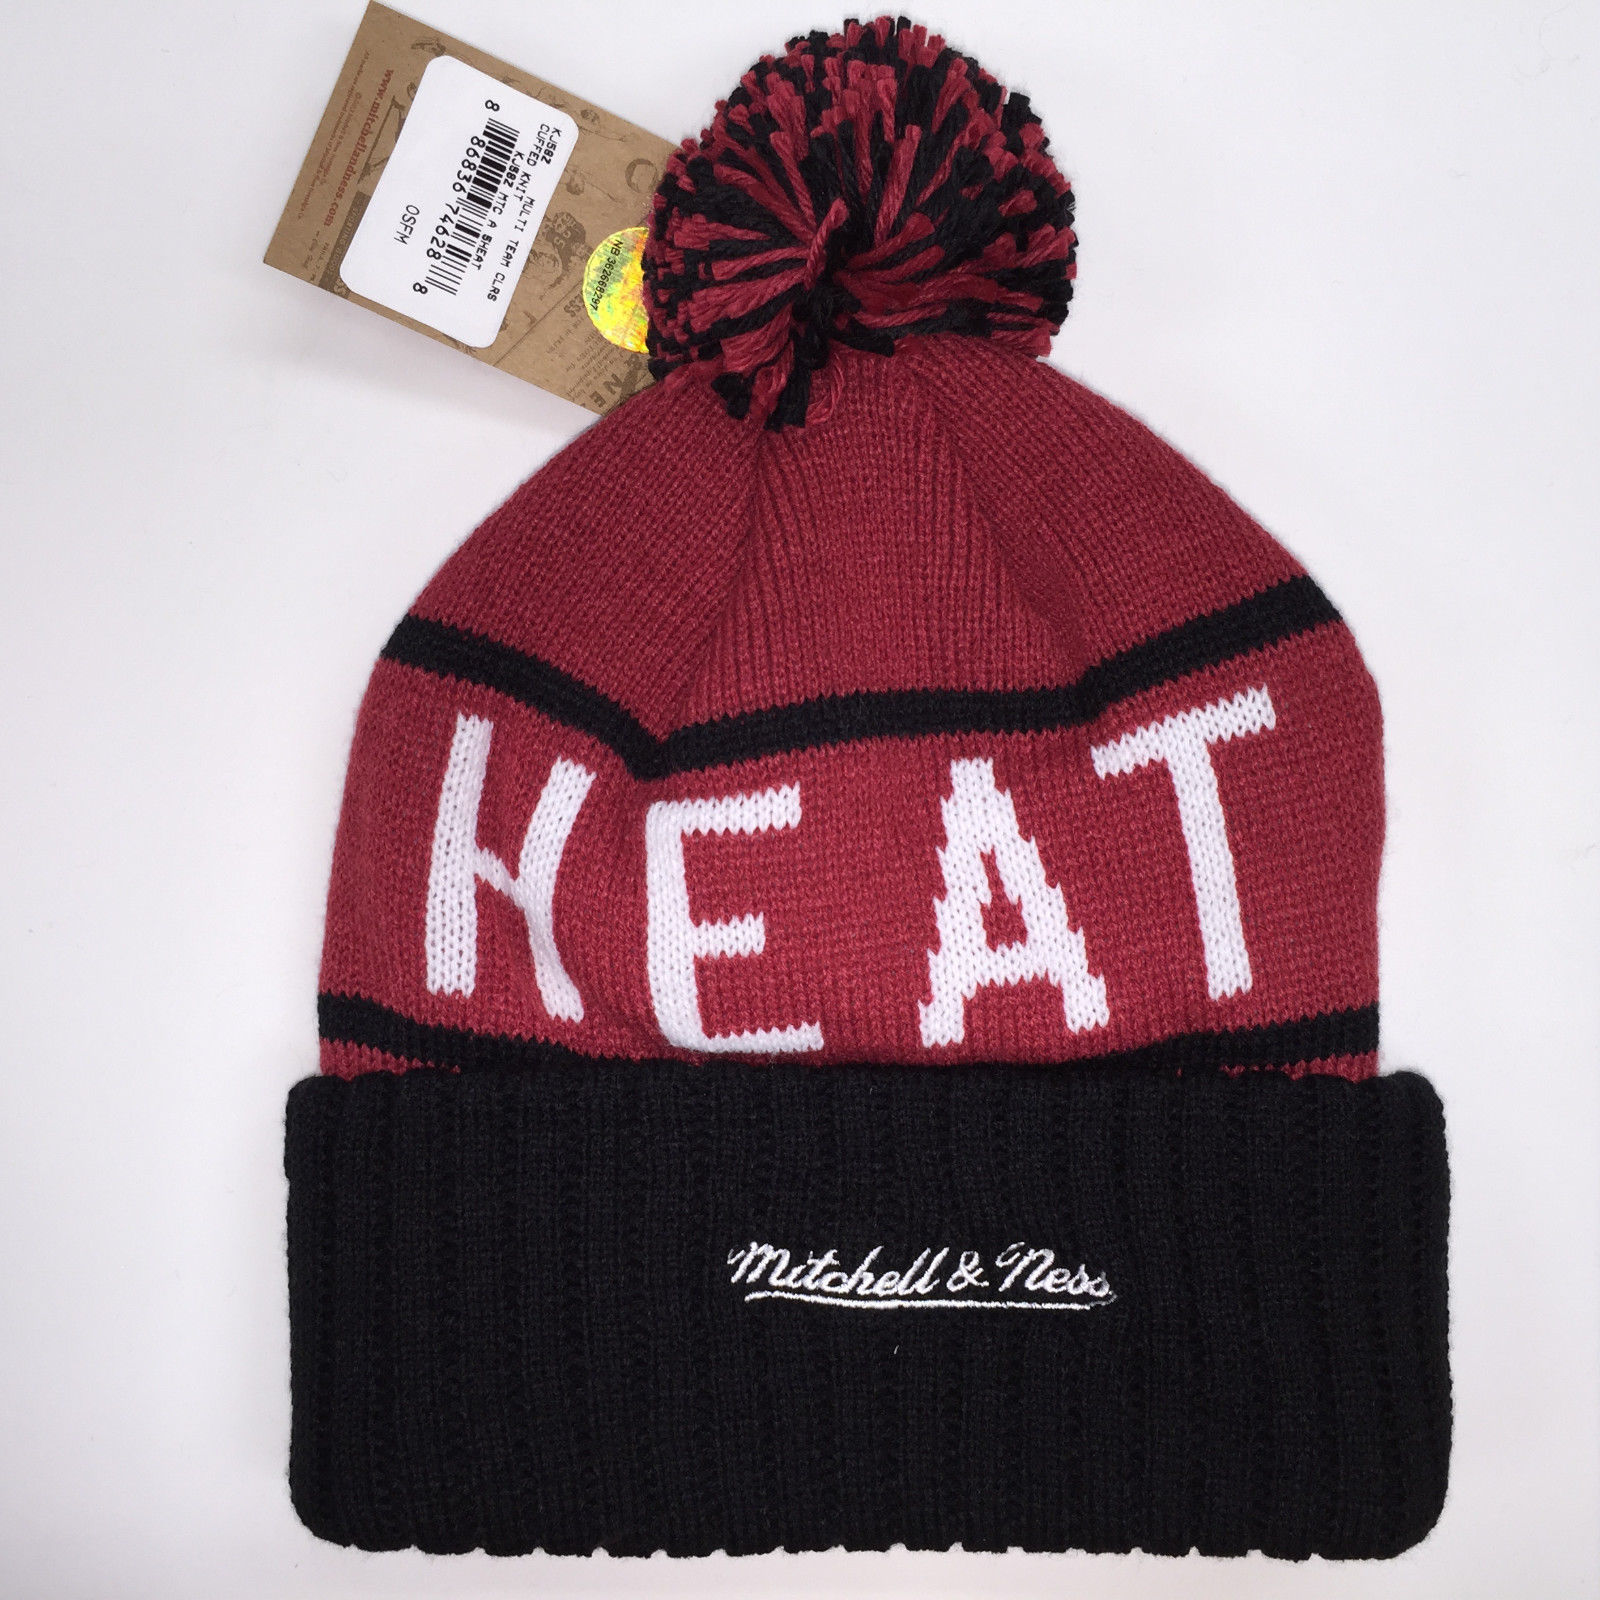 Mitchell & Ness NBA Miami Heat High 5 Cuffed Knit Beanie 11896